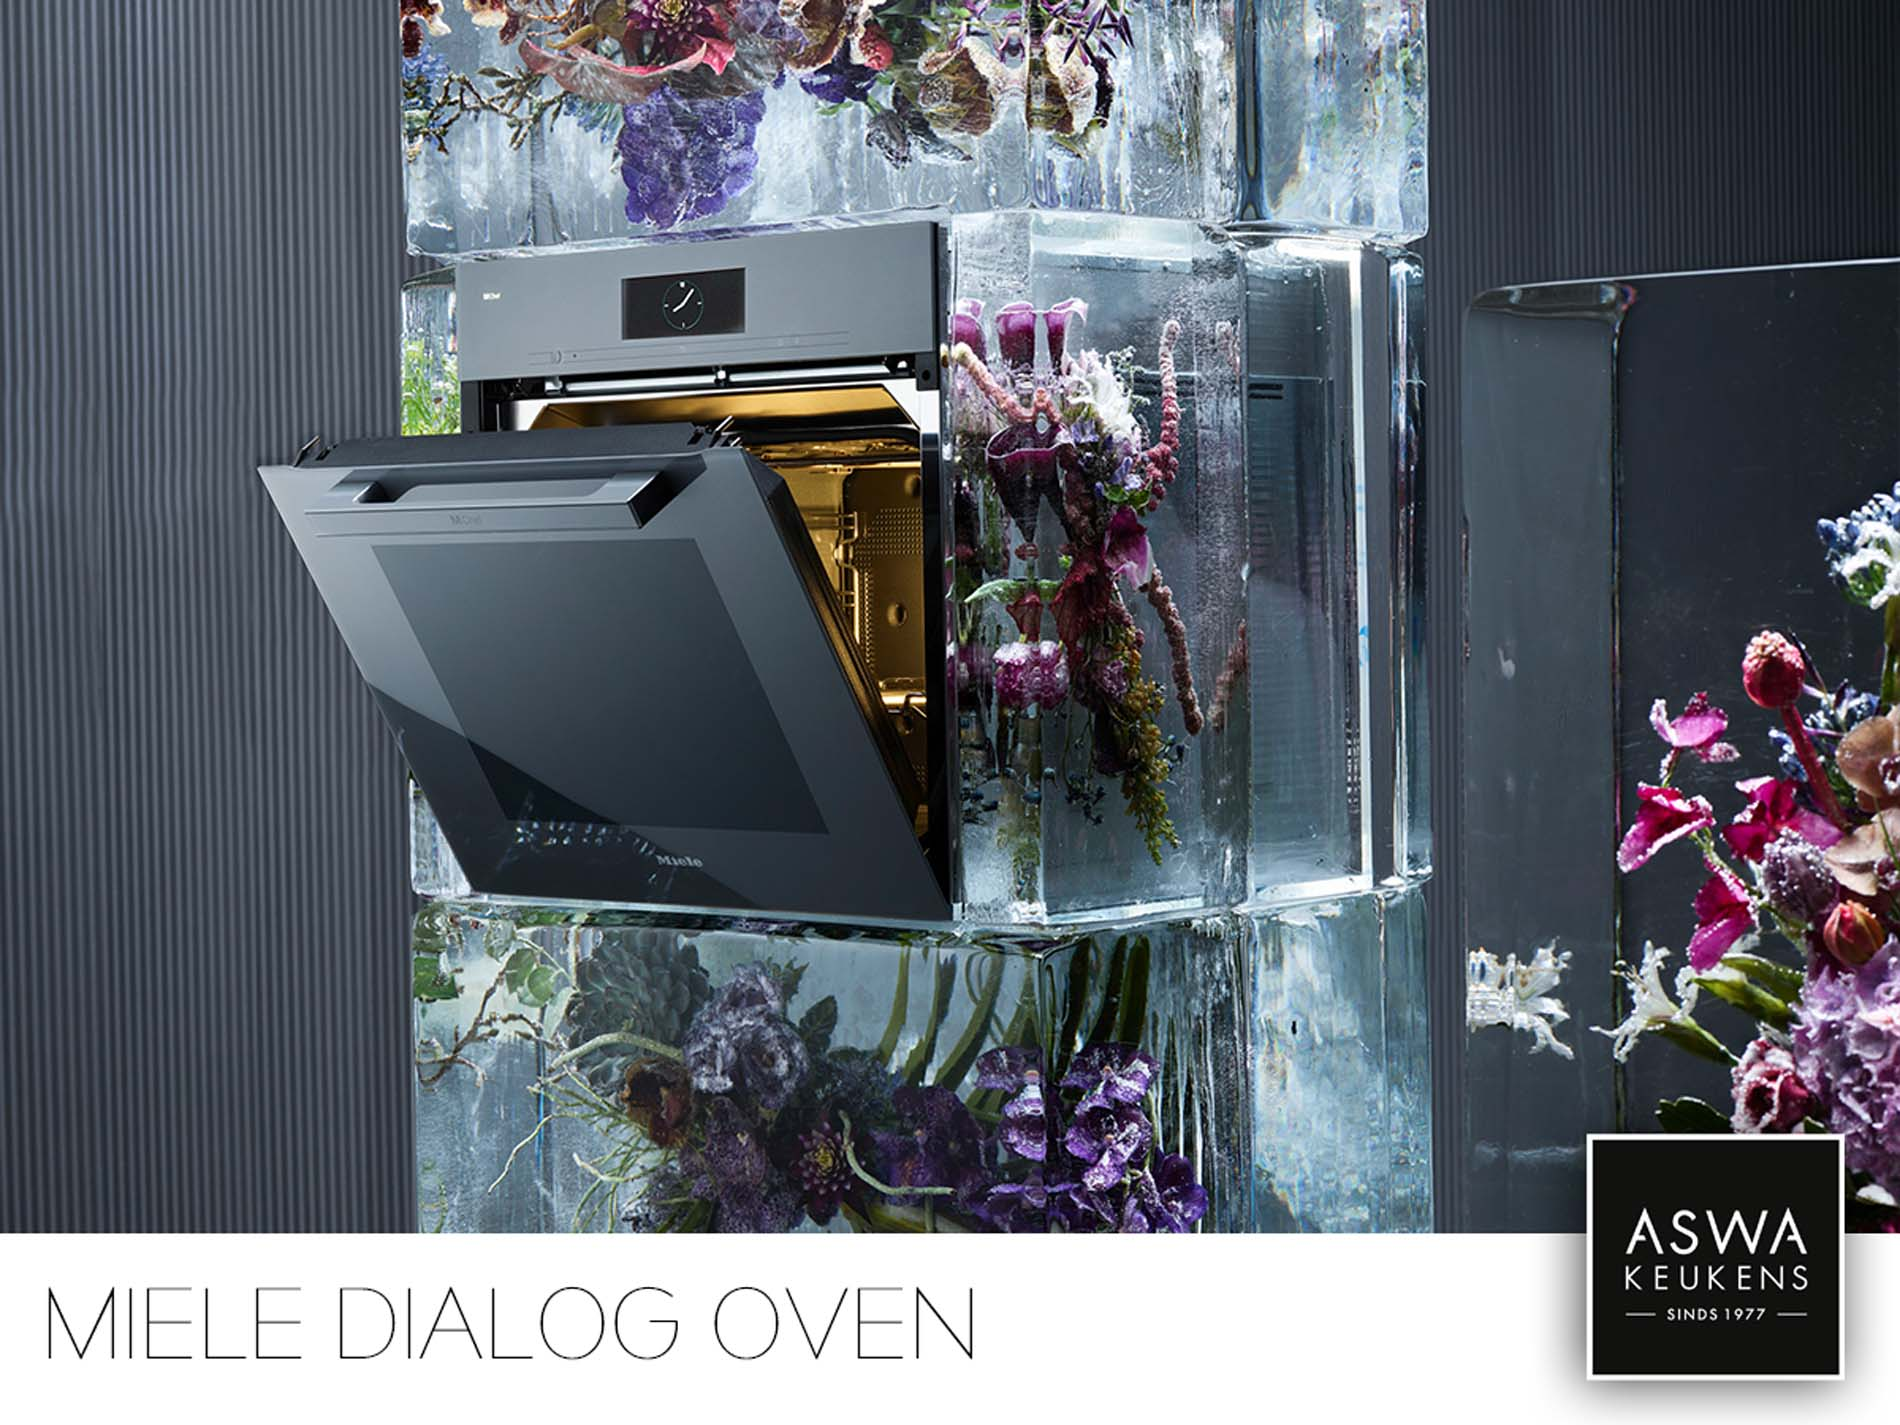 Miele keukenapparatuur Miele Dialog Oven, ASWA Keukens